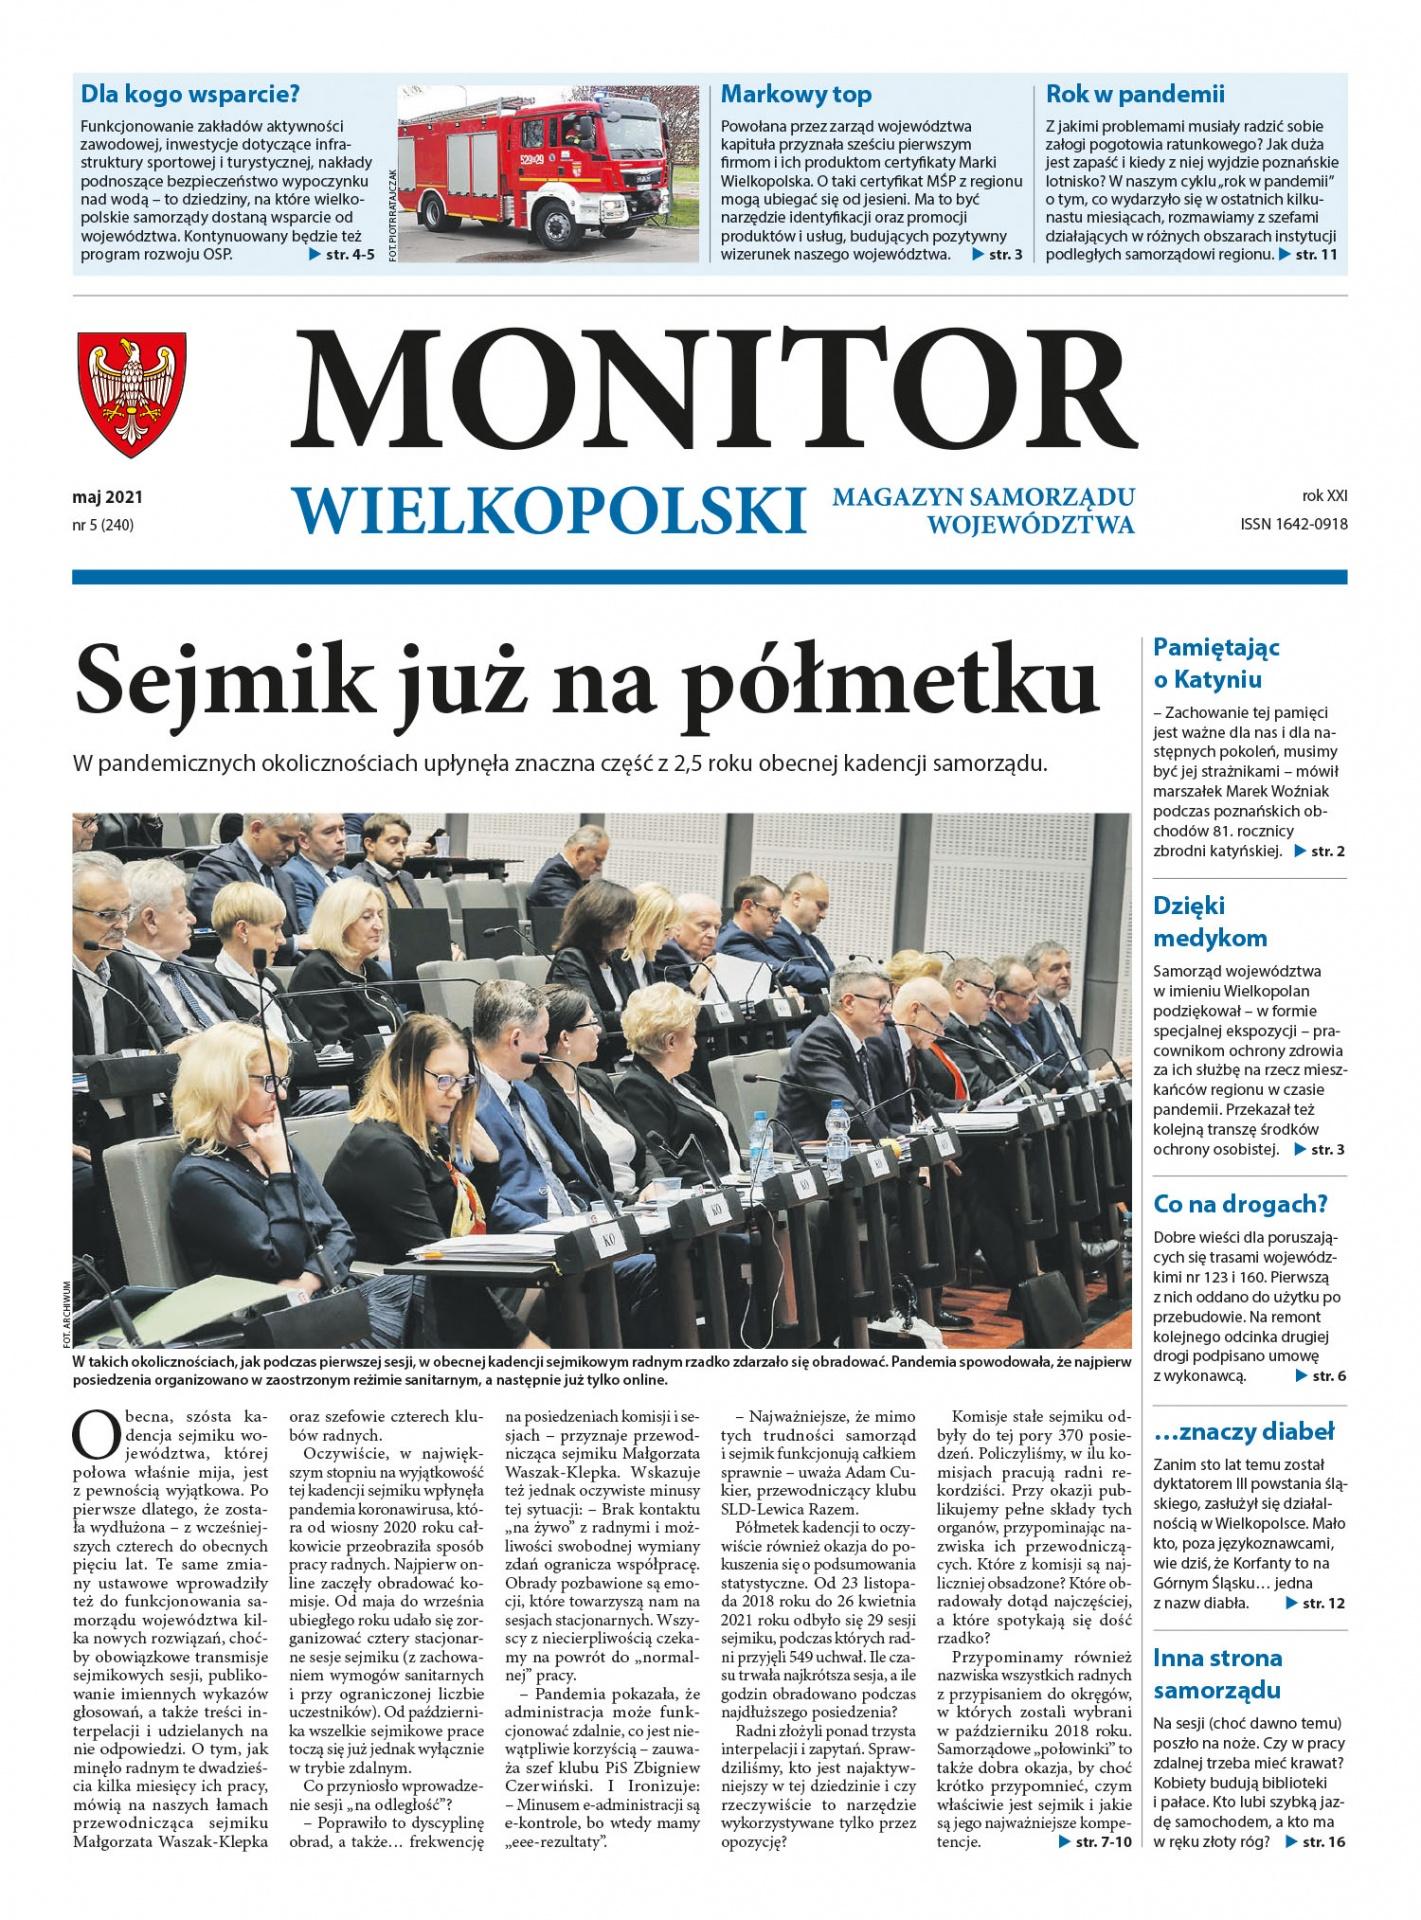 monitor-maj-01.jpg